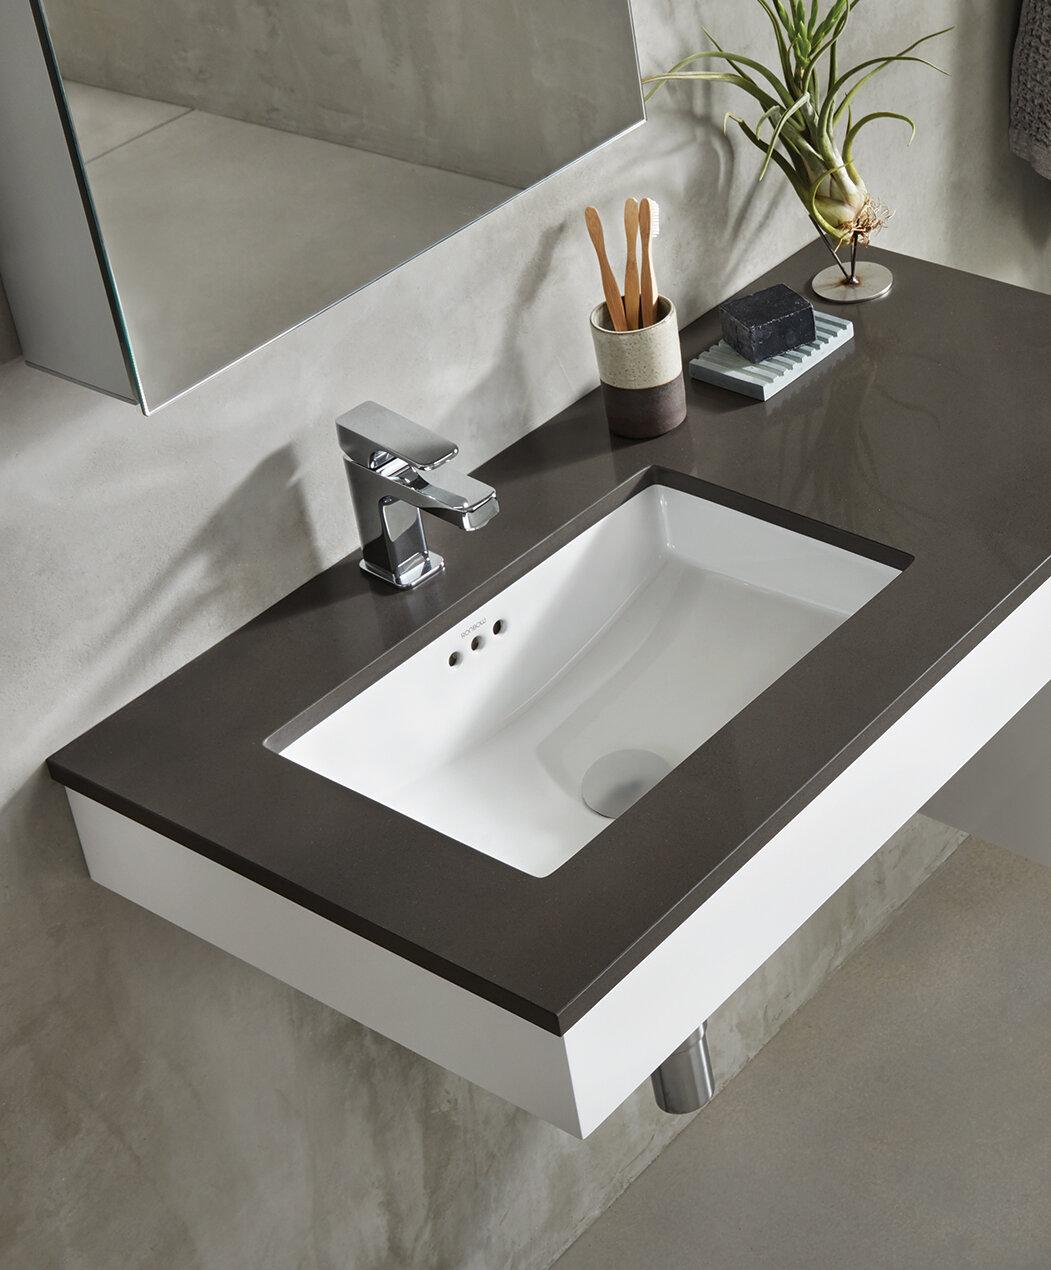 Genial Ronbow Essence Ceramic Rectangular Undermount Bathroom Sink With Overflow U0026  Reviews | Wayfair